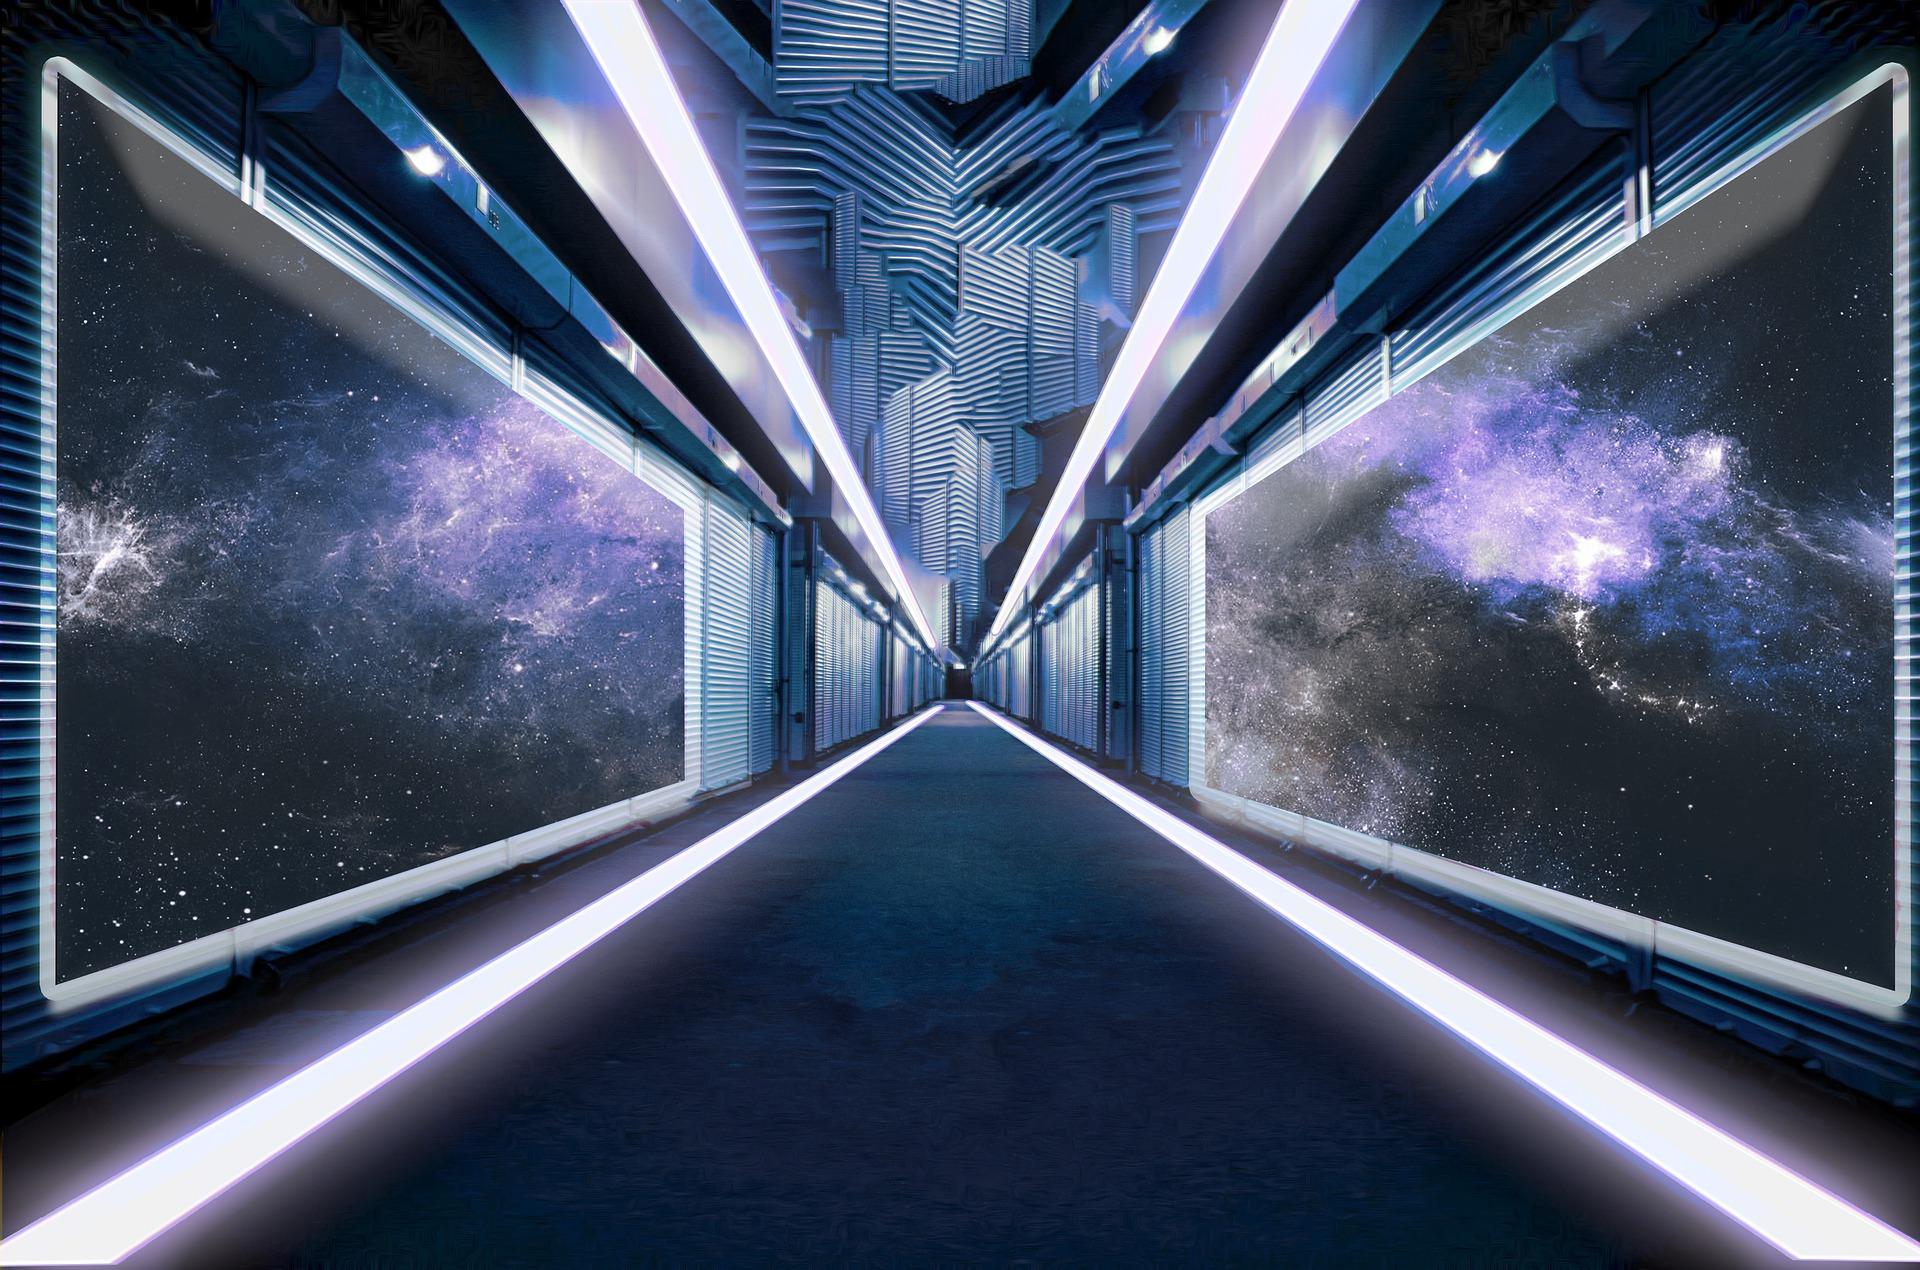 spaceship-4666452_1920